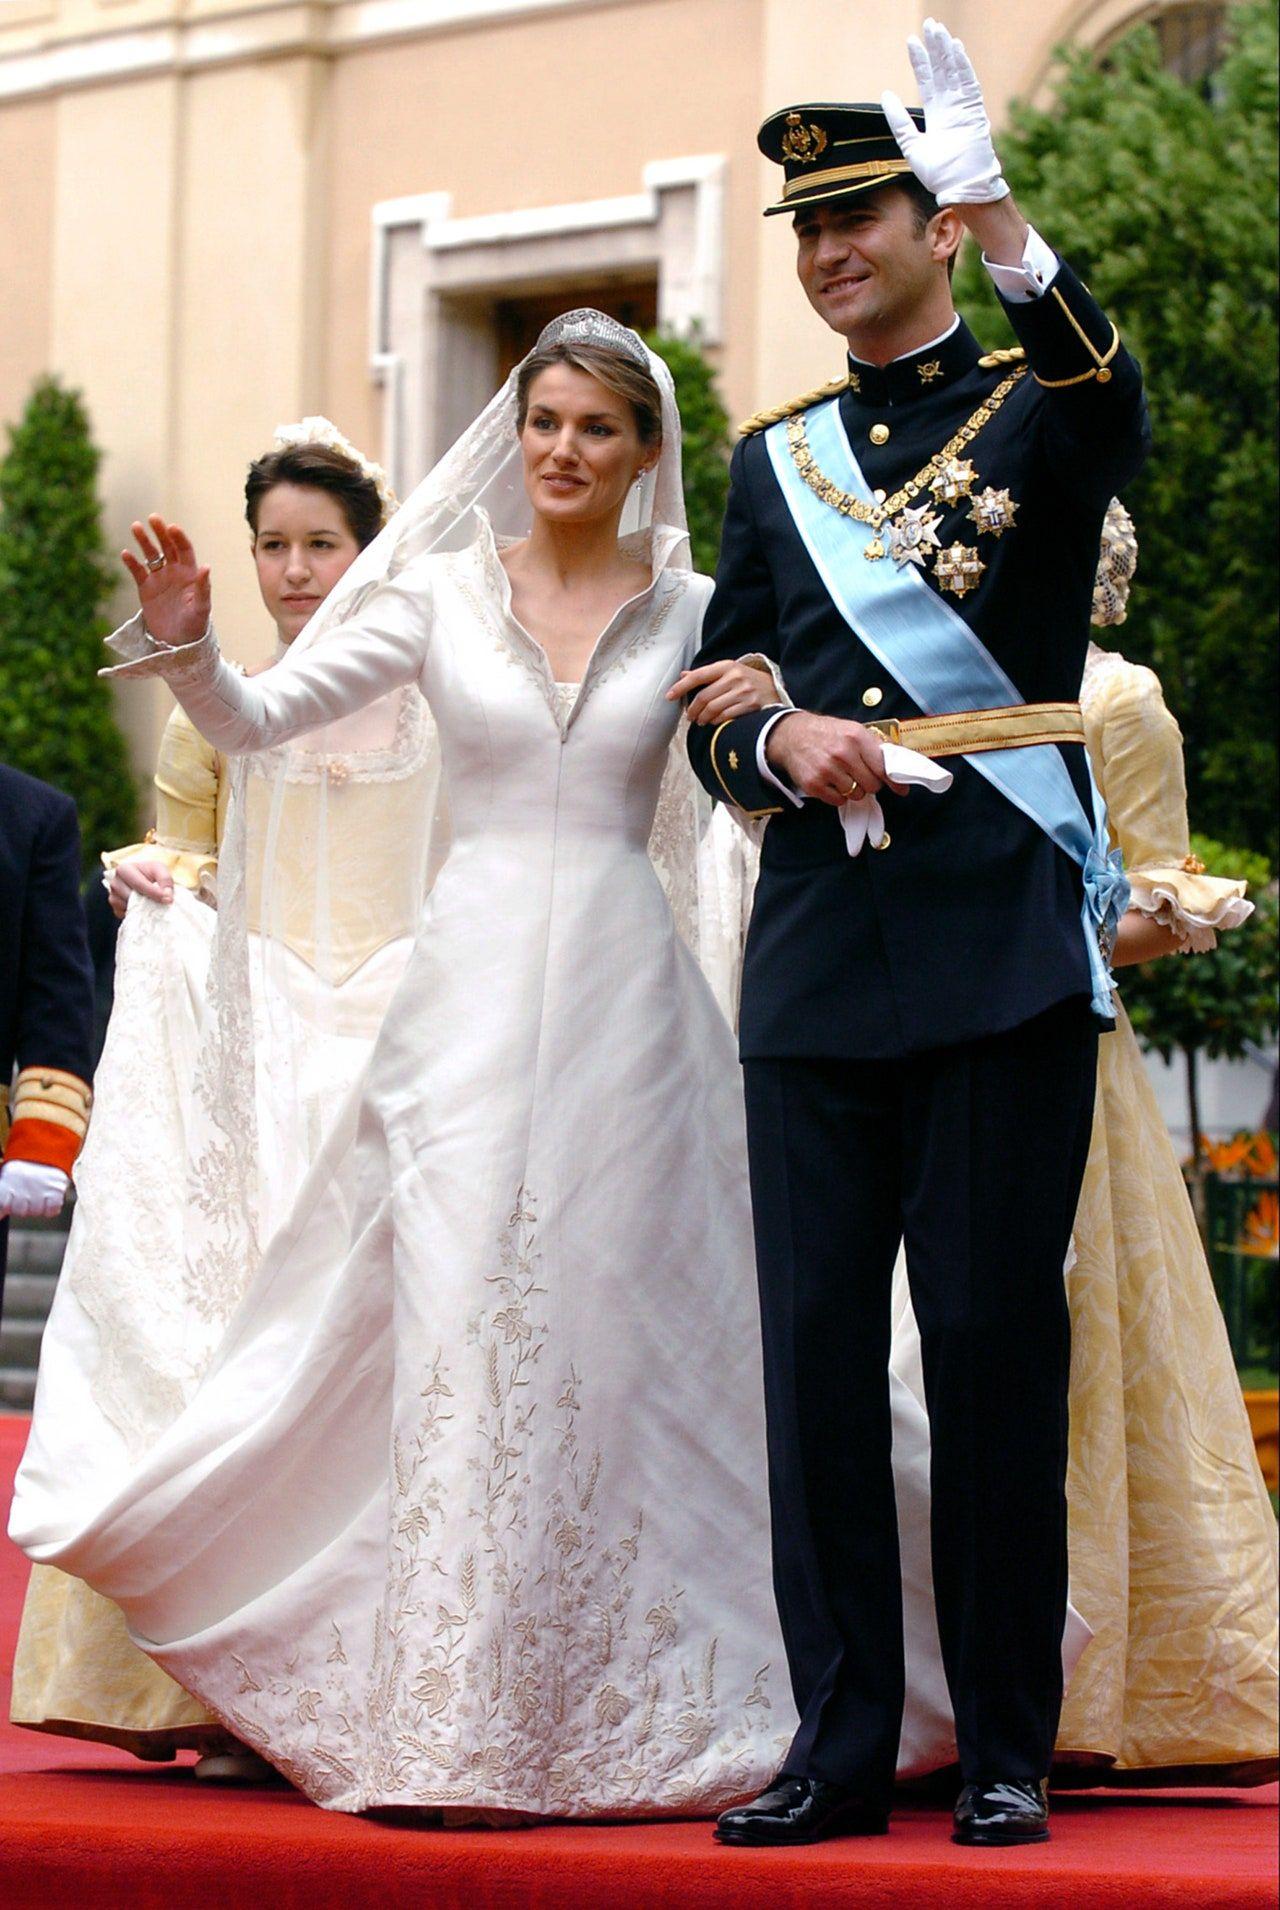 Gaun pengantin Ratu Letizia dari Spanyol